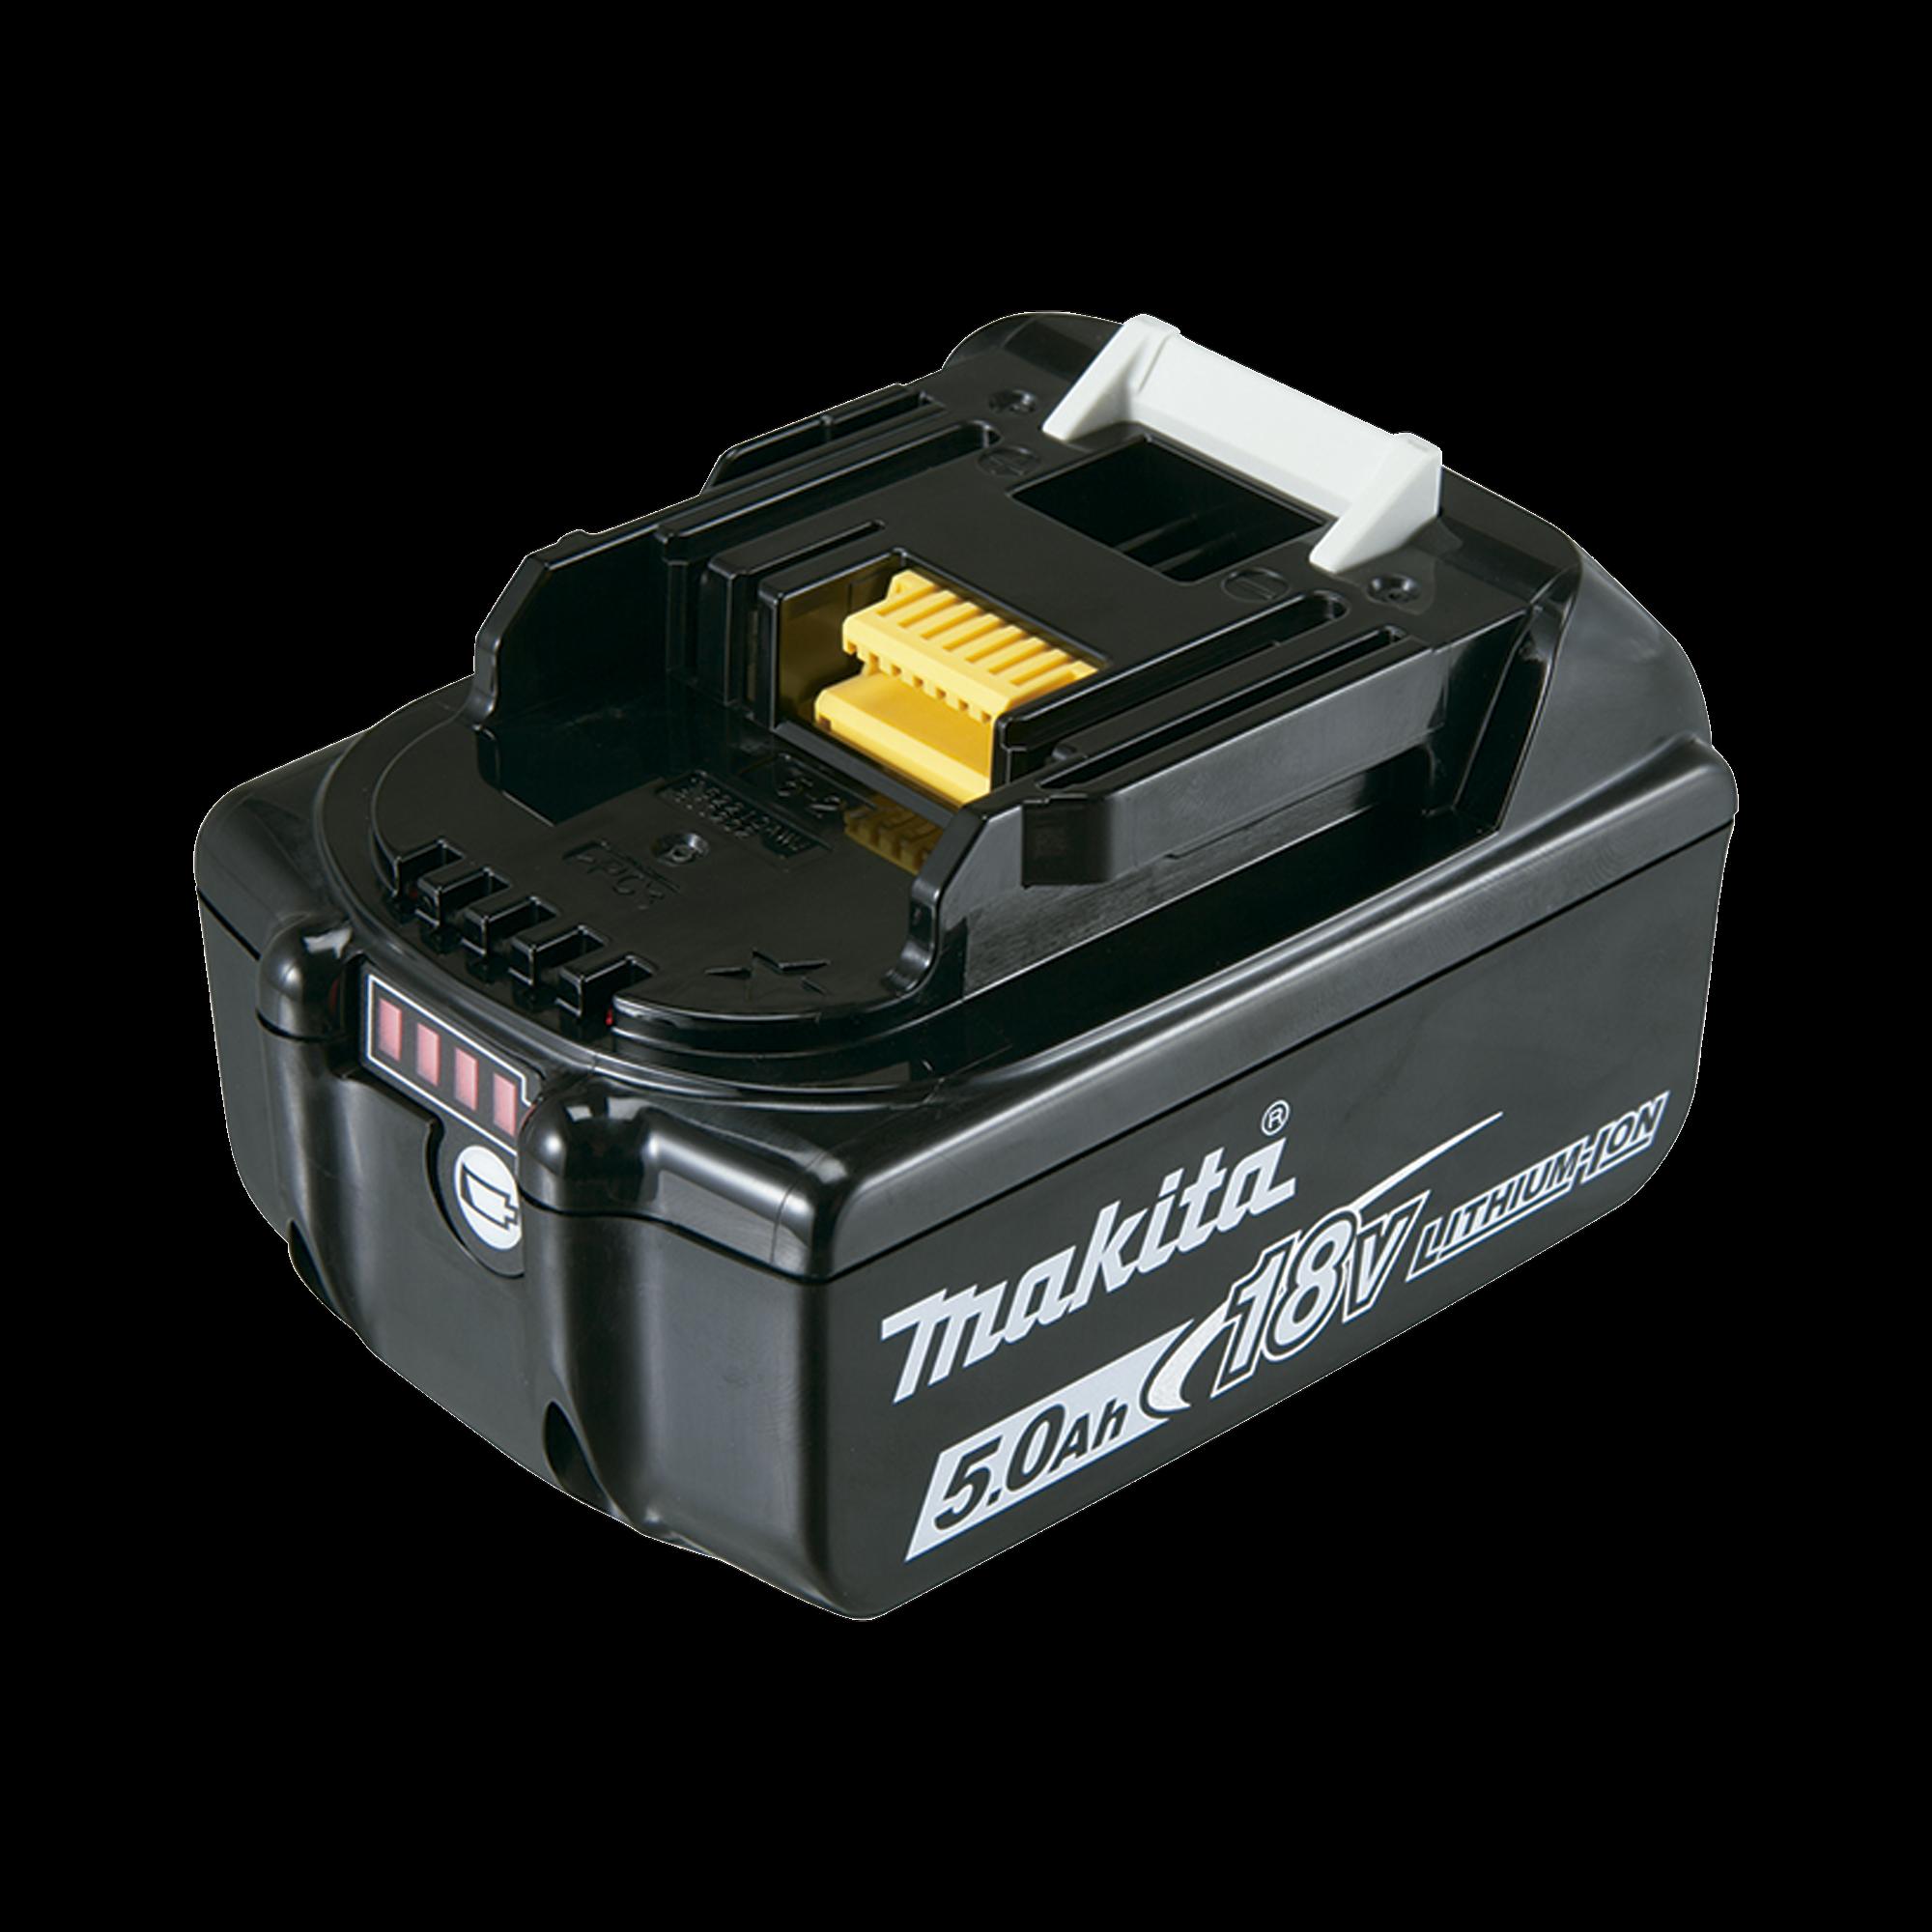 Bateria de 3.0 amperes, con indicador de carga